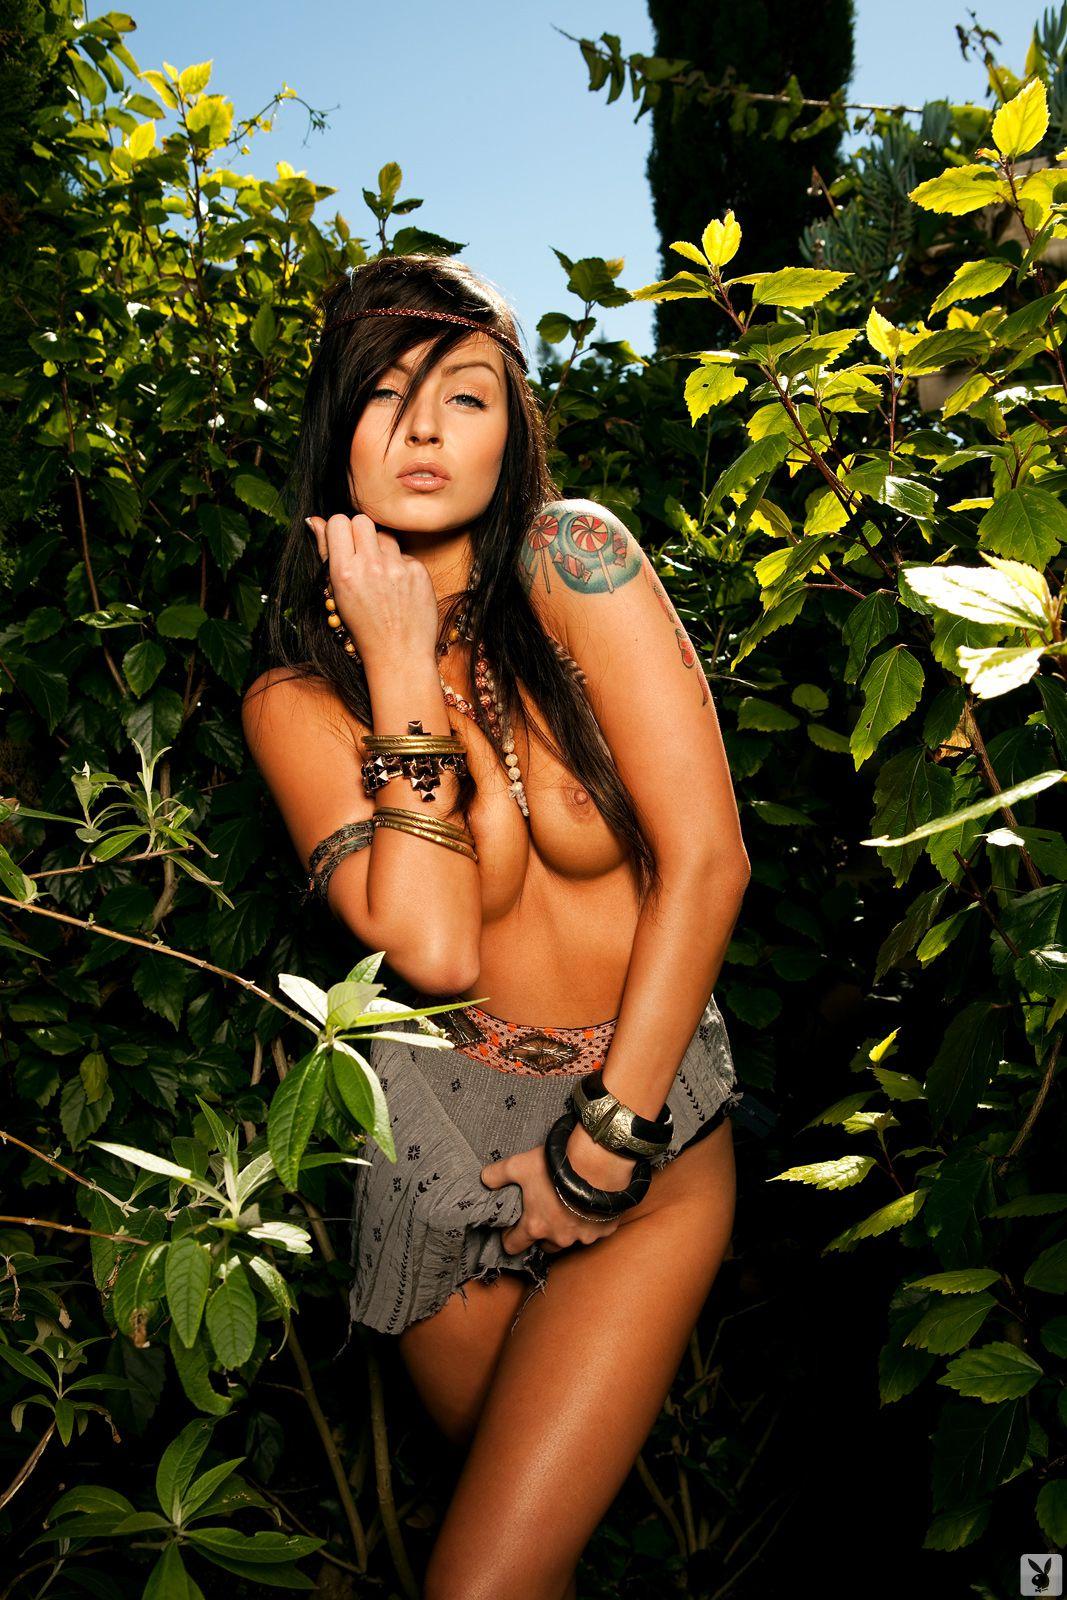 Veronica_LaVery (35)